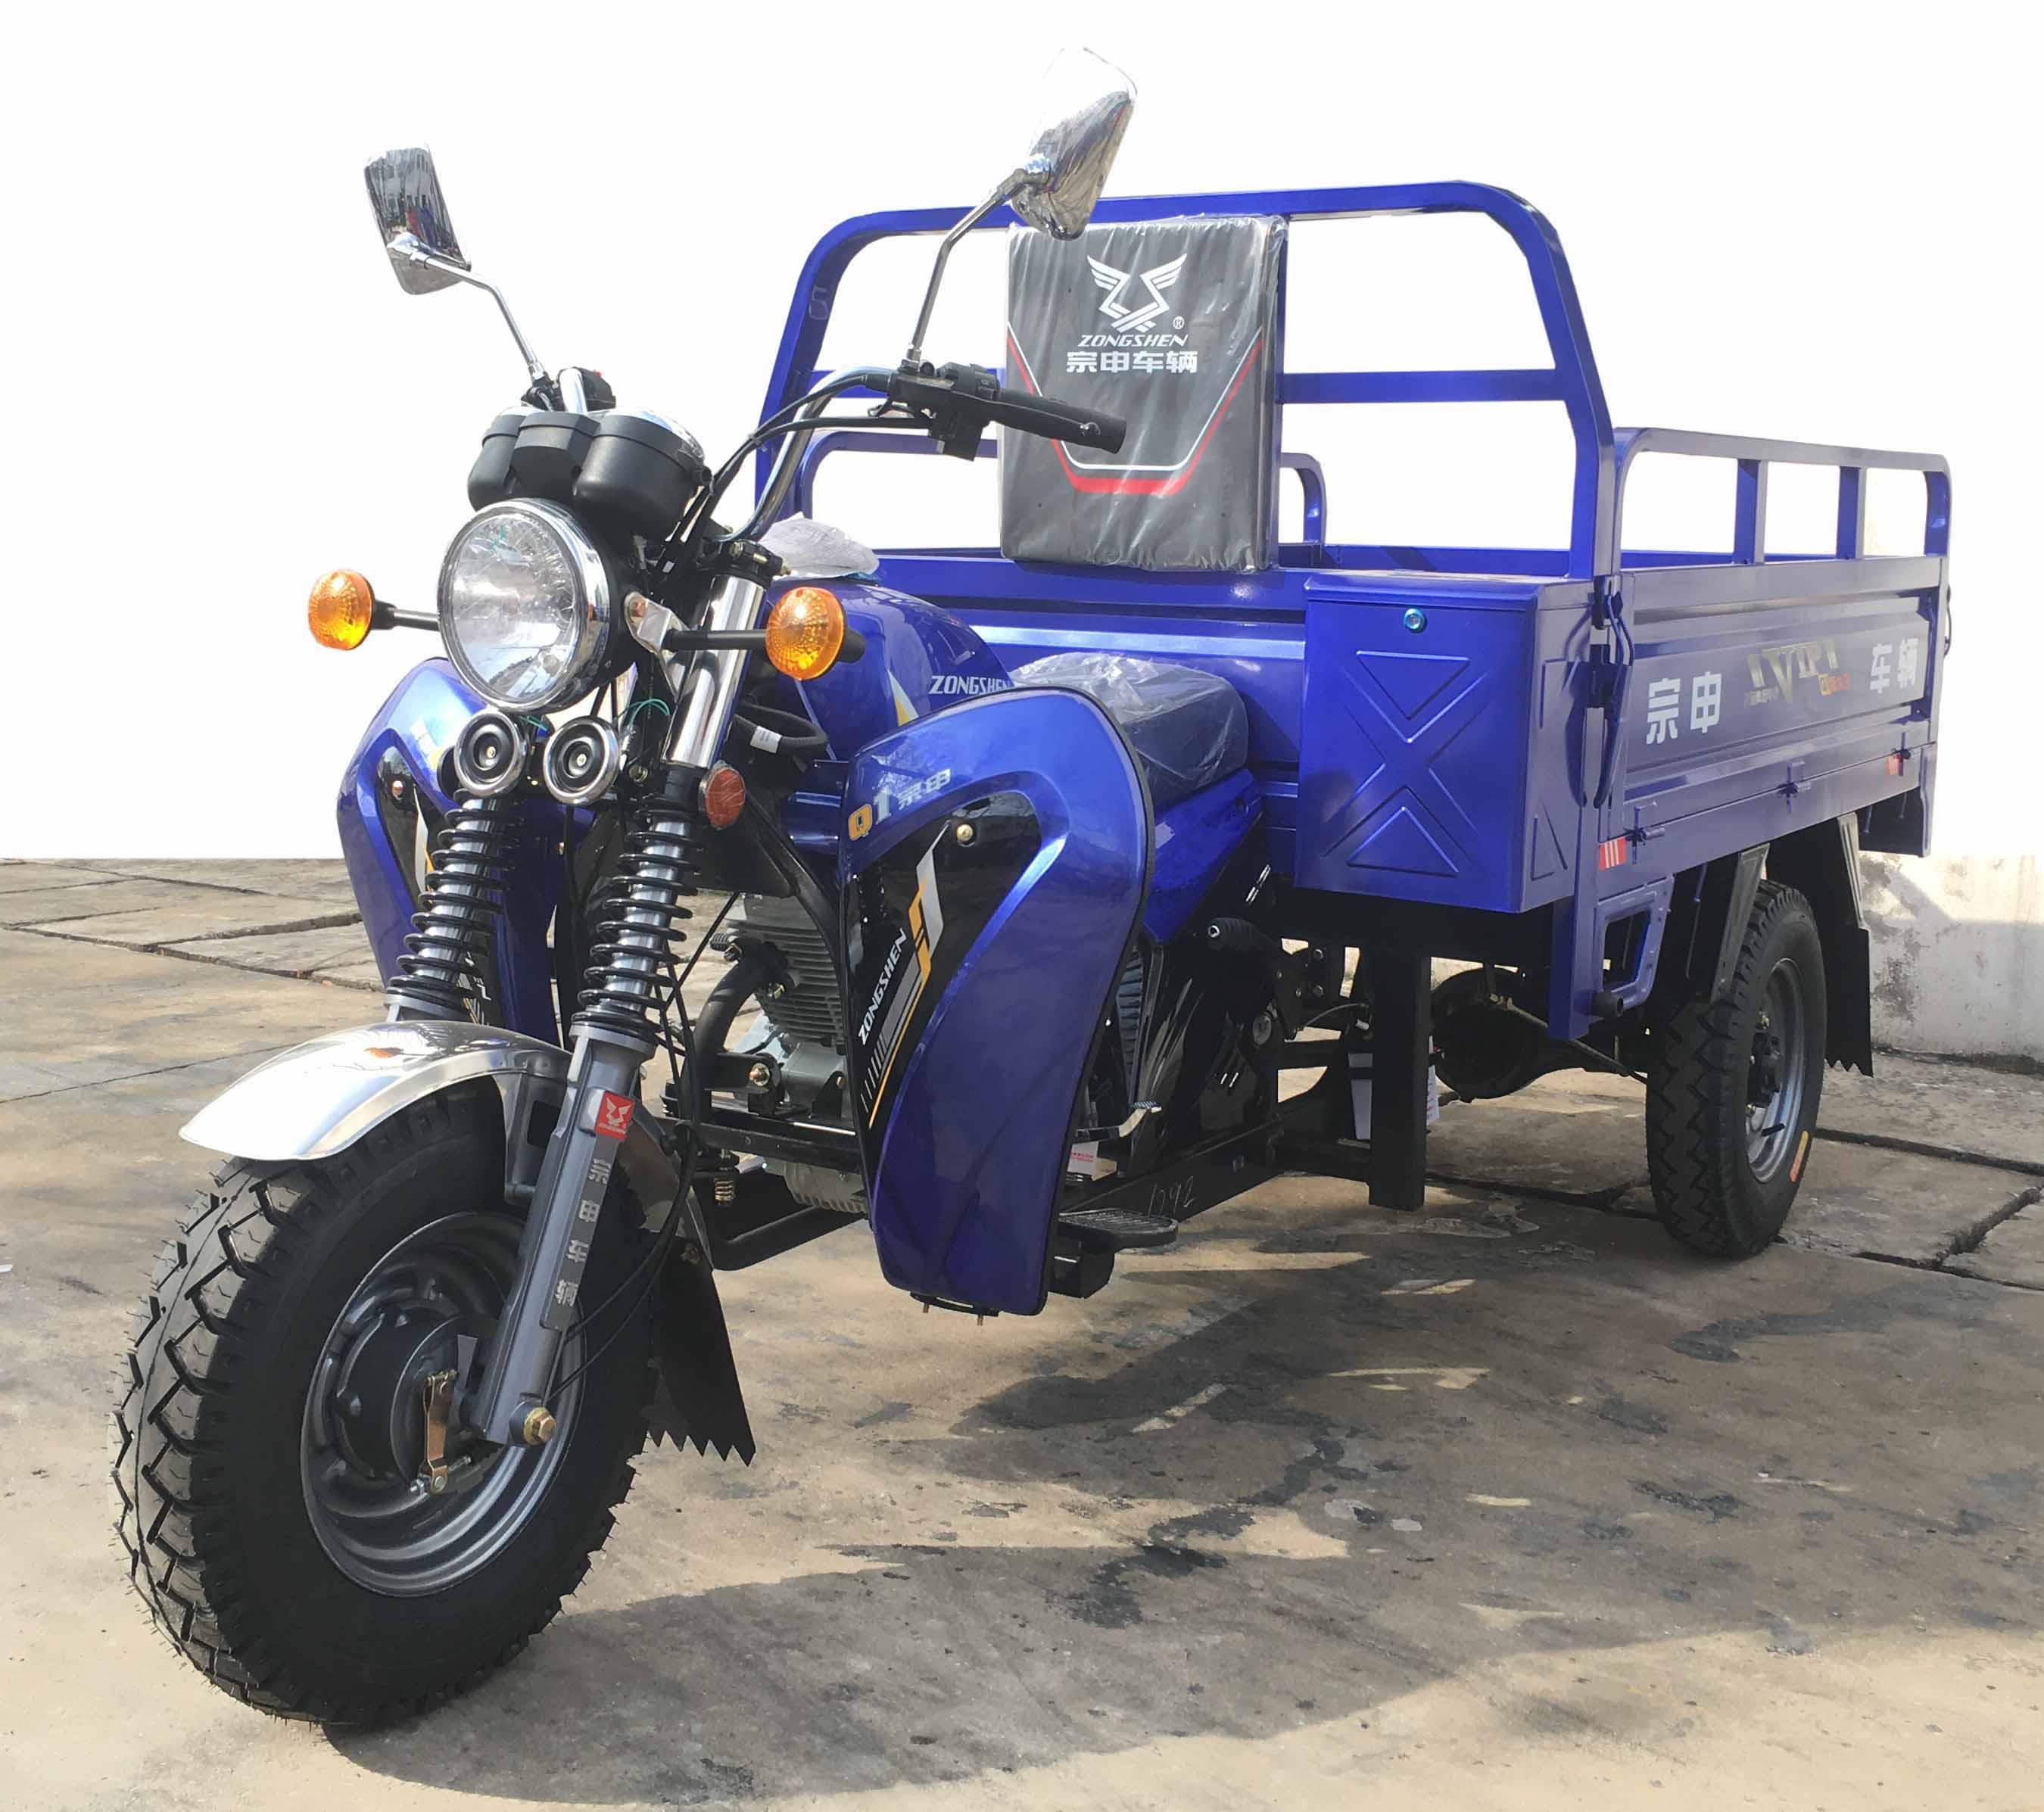 zs175zh-9a型正三轮摩托车